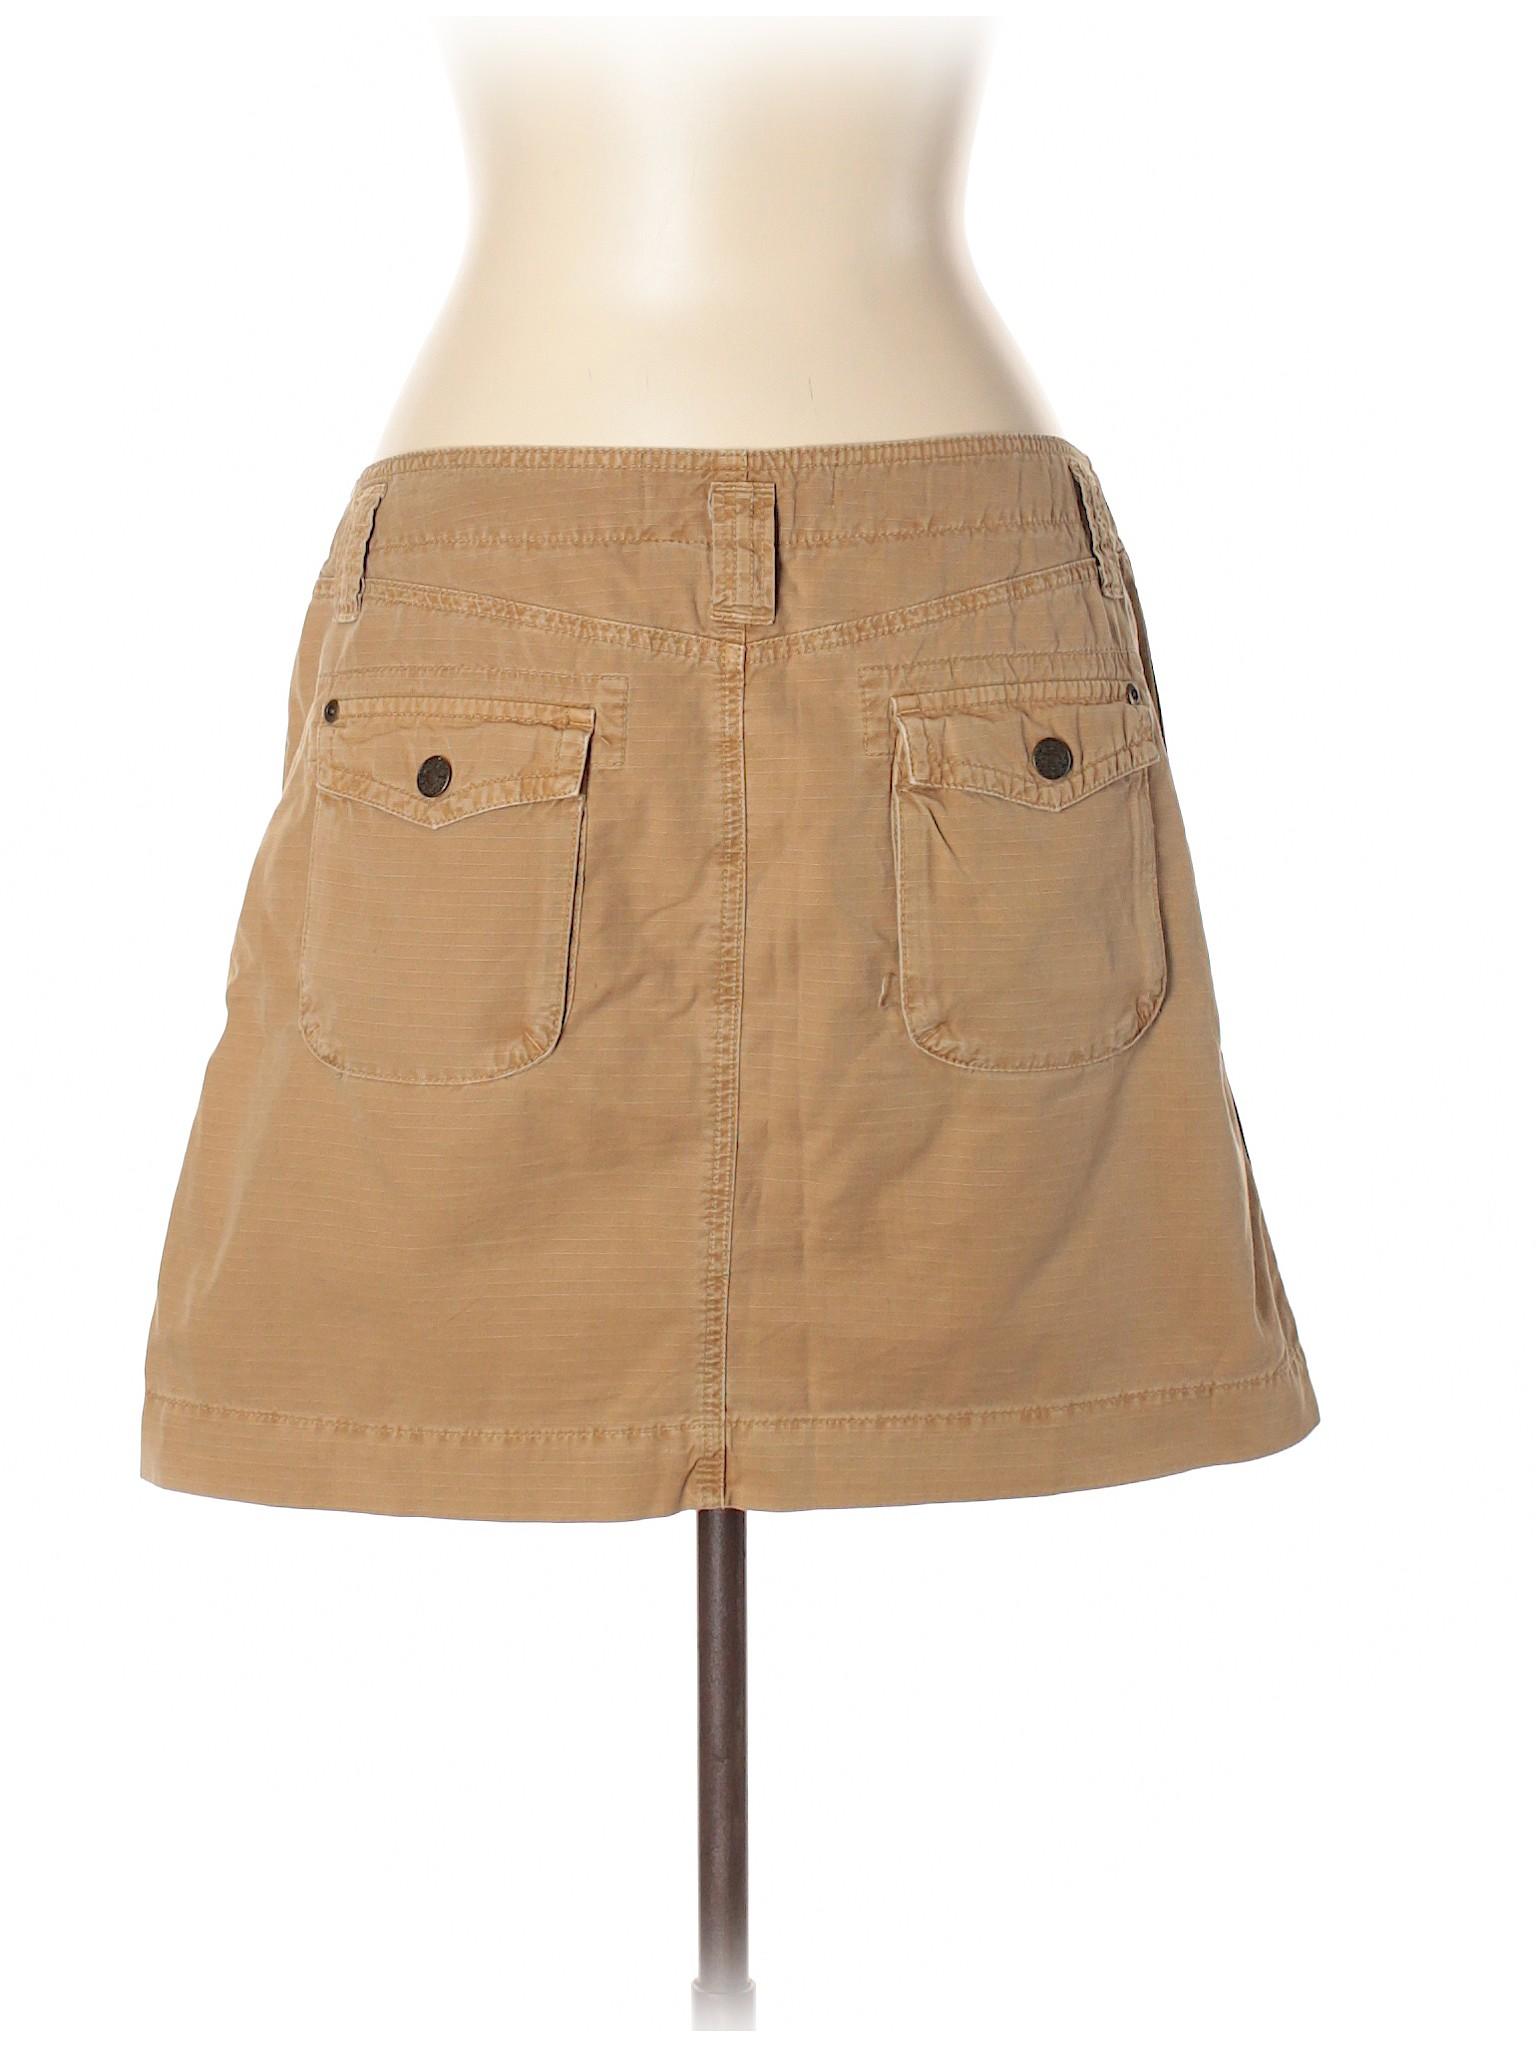 Boutique Skirt Casual Skirt Boutique Casual Skirt Boutique Boutique Casual vqIYz